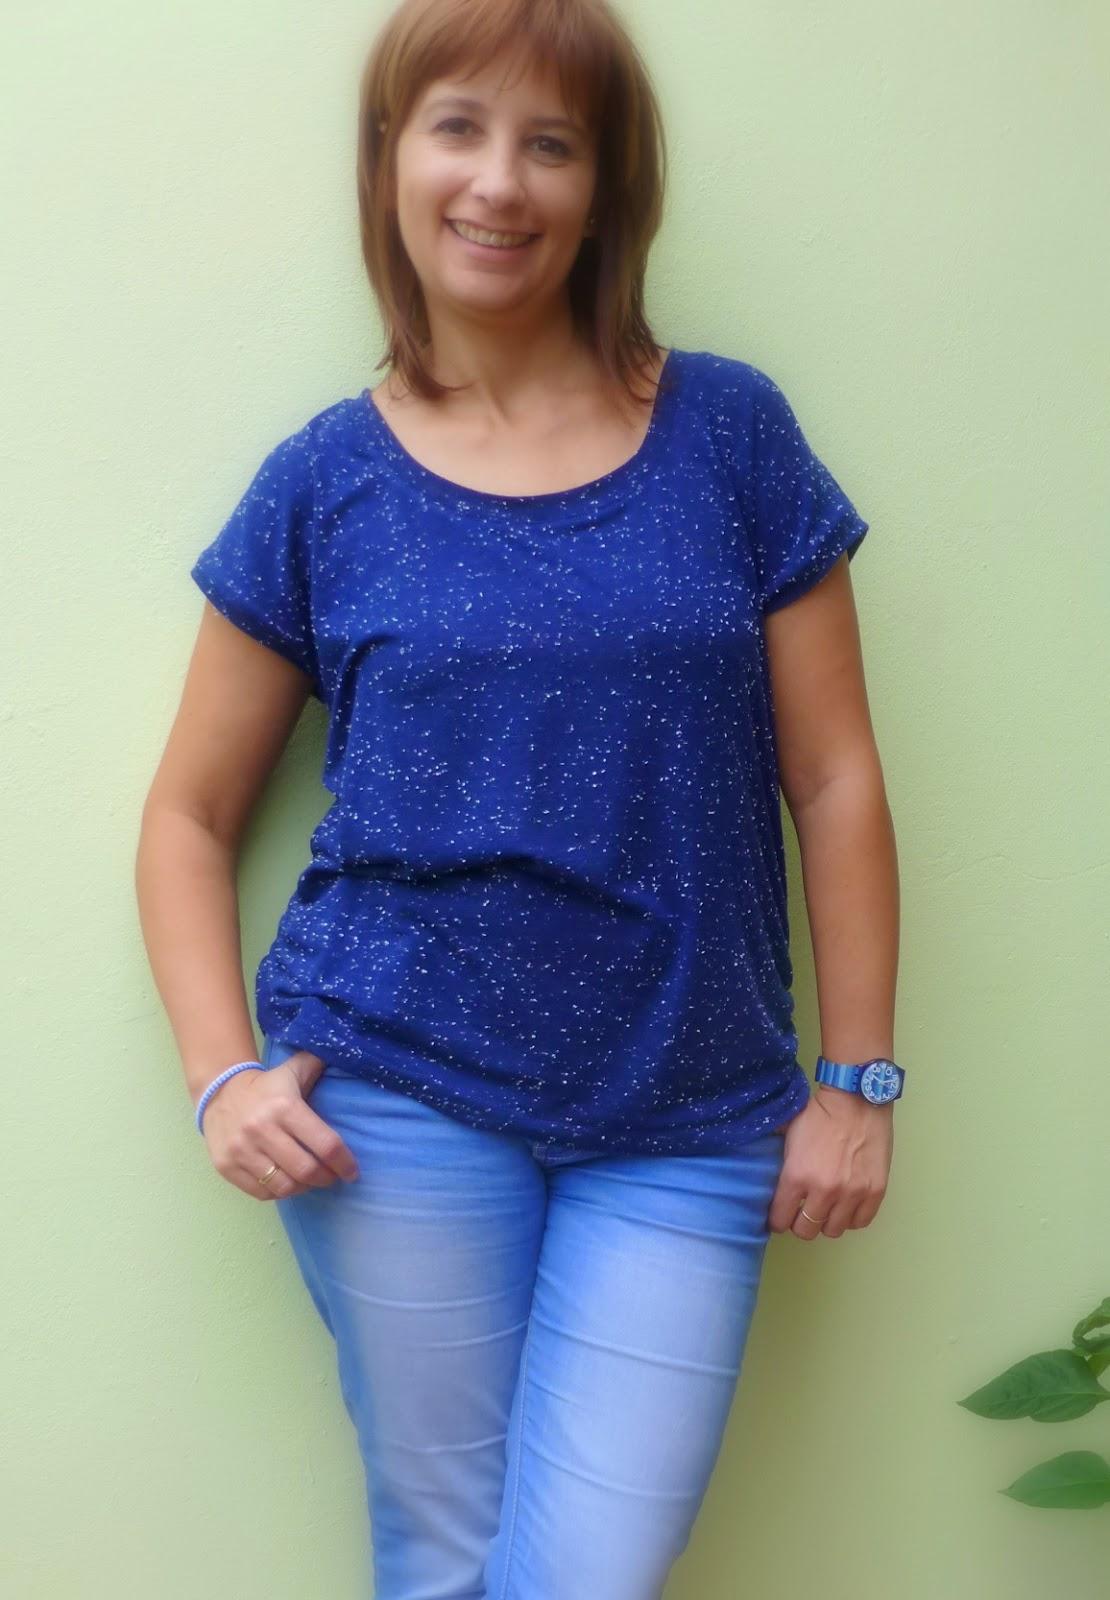 hemlock tee grainline studio patron costura gratis facil comodo free sewing pattern